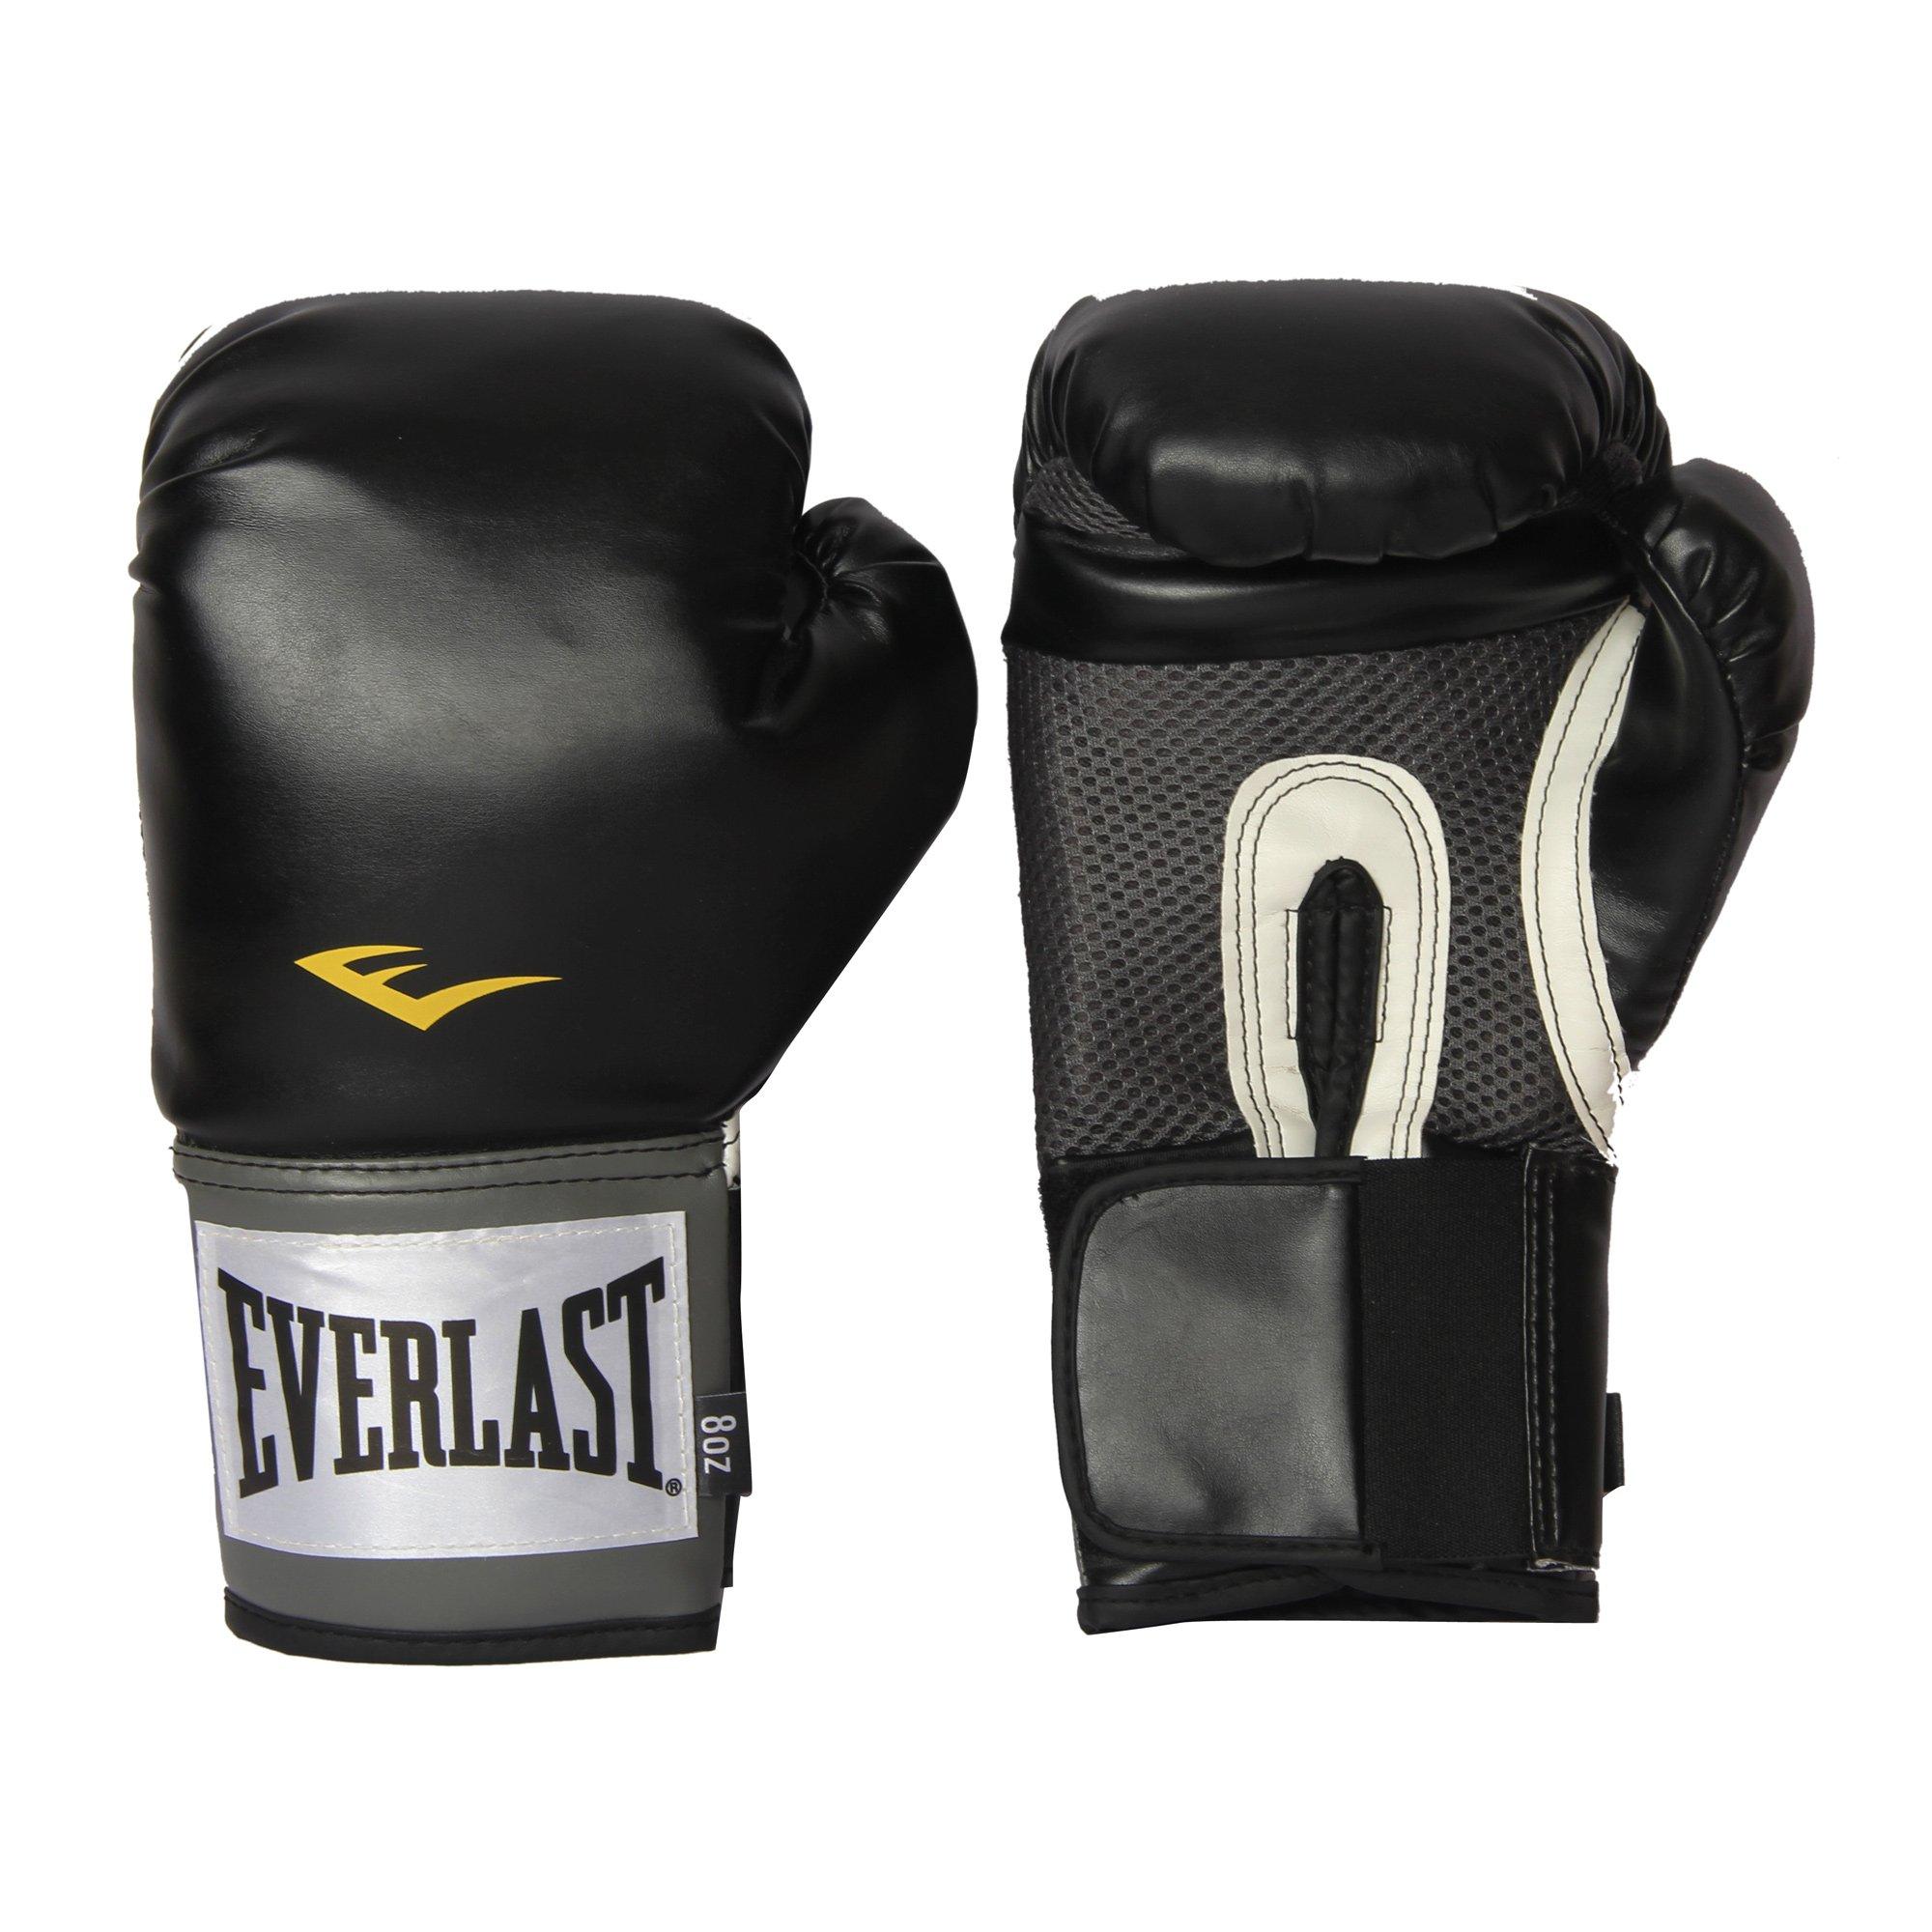 Everlast Pro Style Training Gloves (Black, 12 oz.)